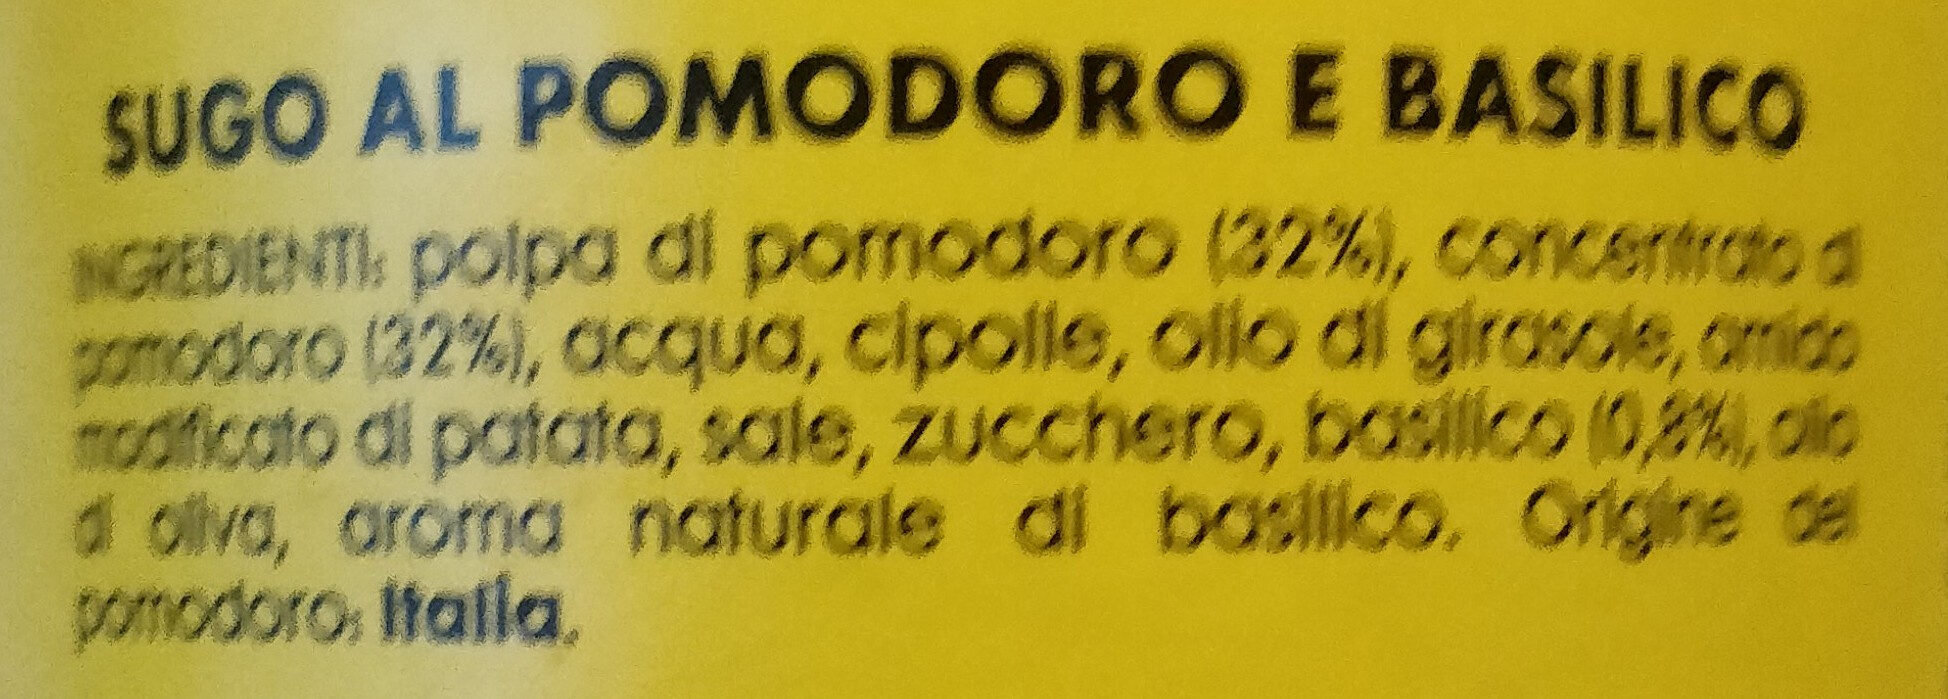 sugo al pomodoro e basilico - Ingredients - it